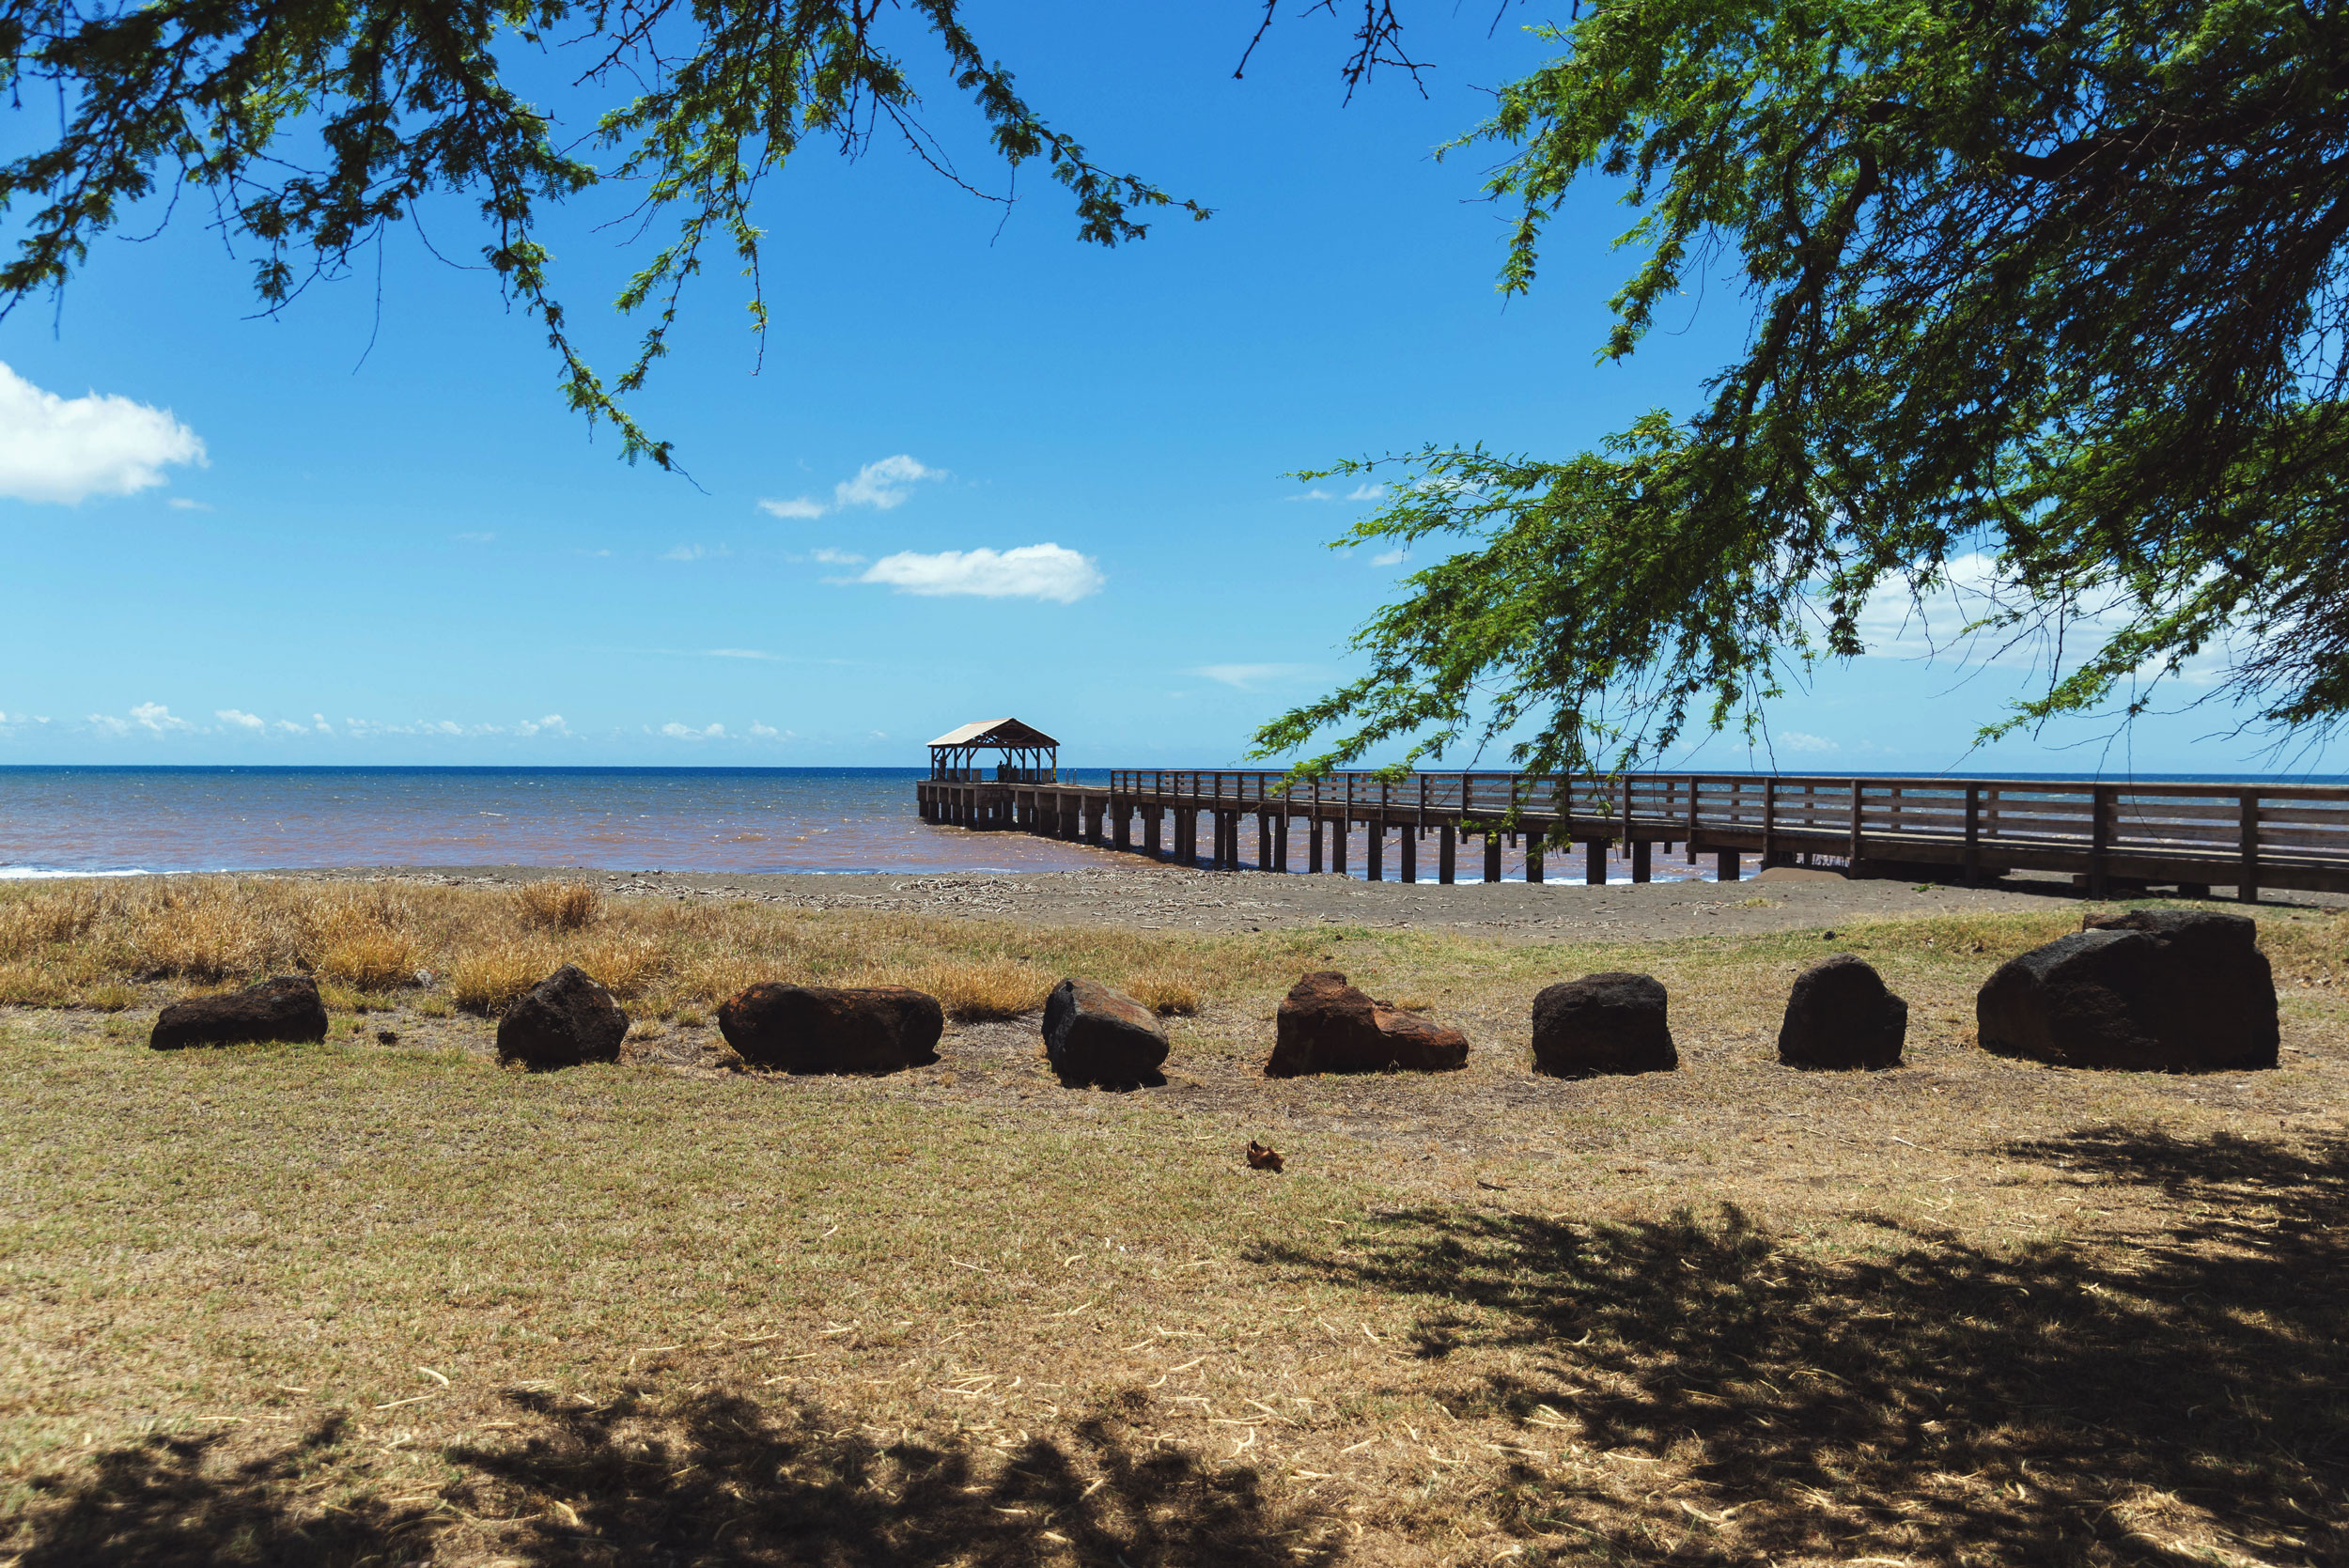 Waimea Landing pier in Waimea